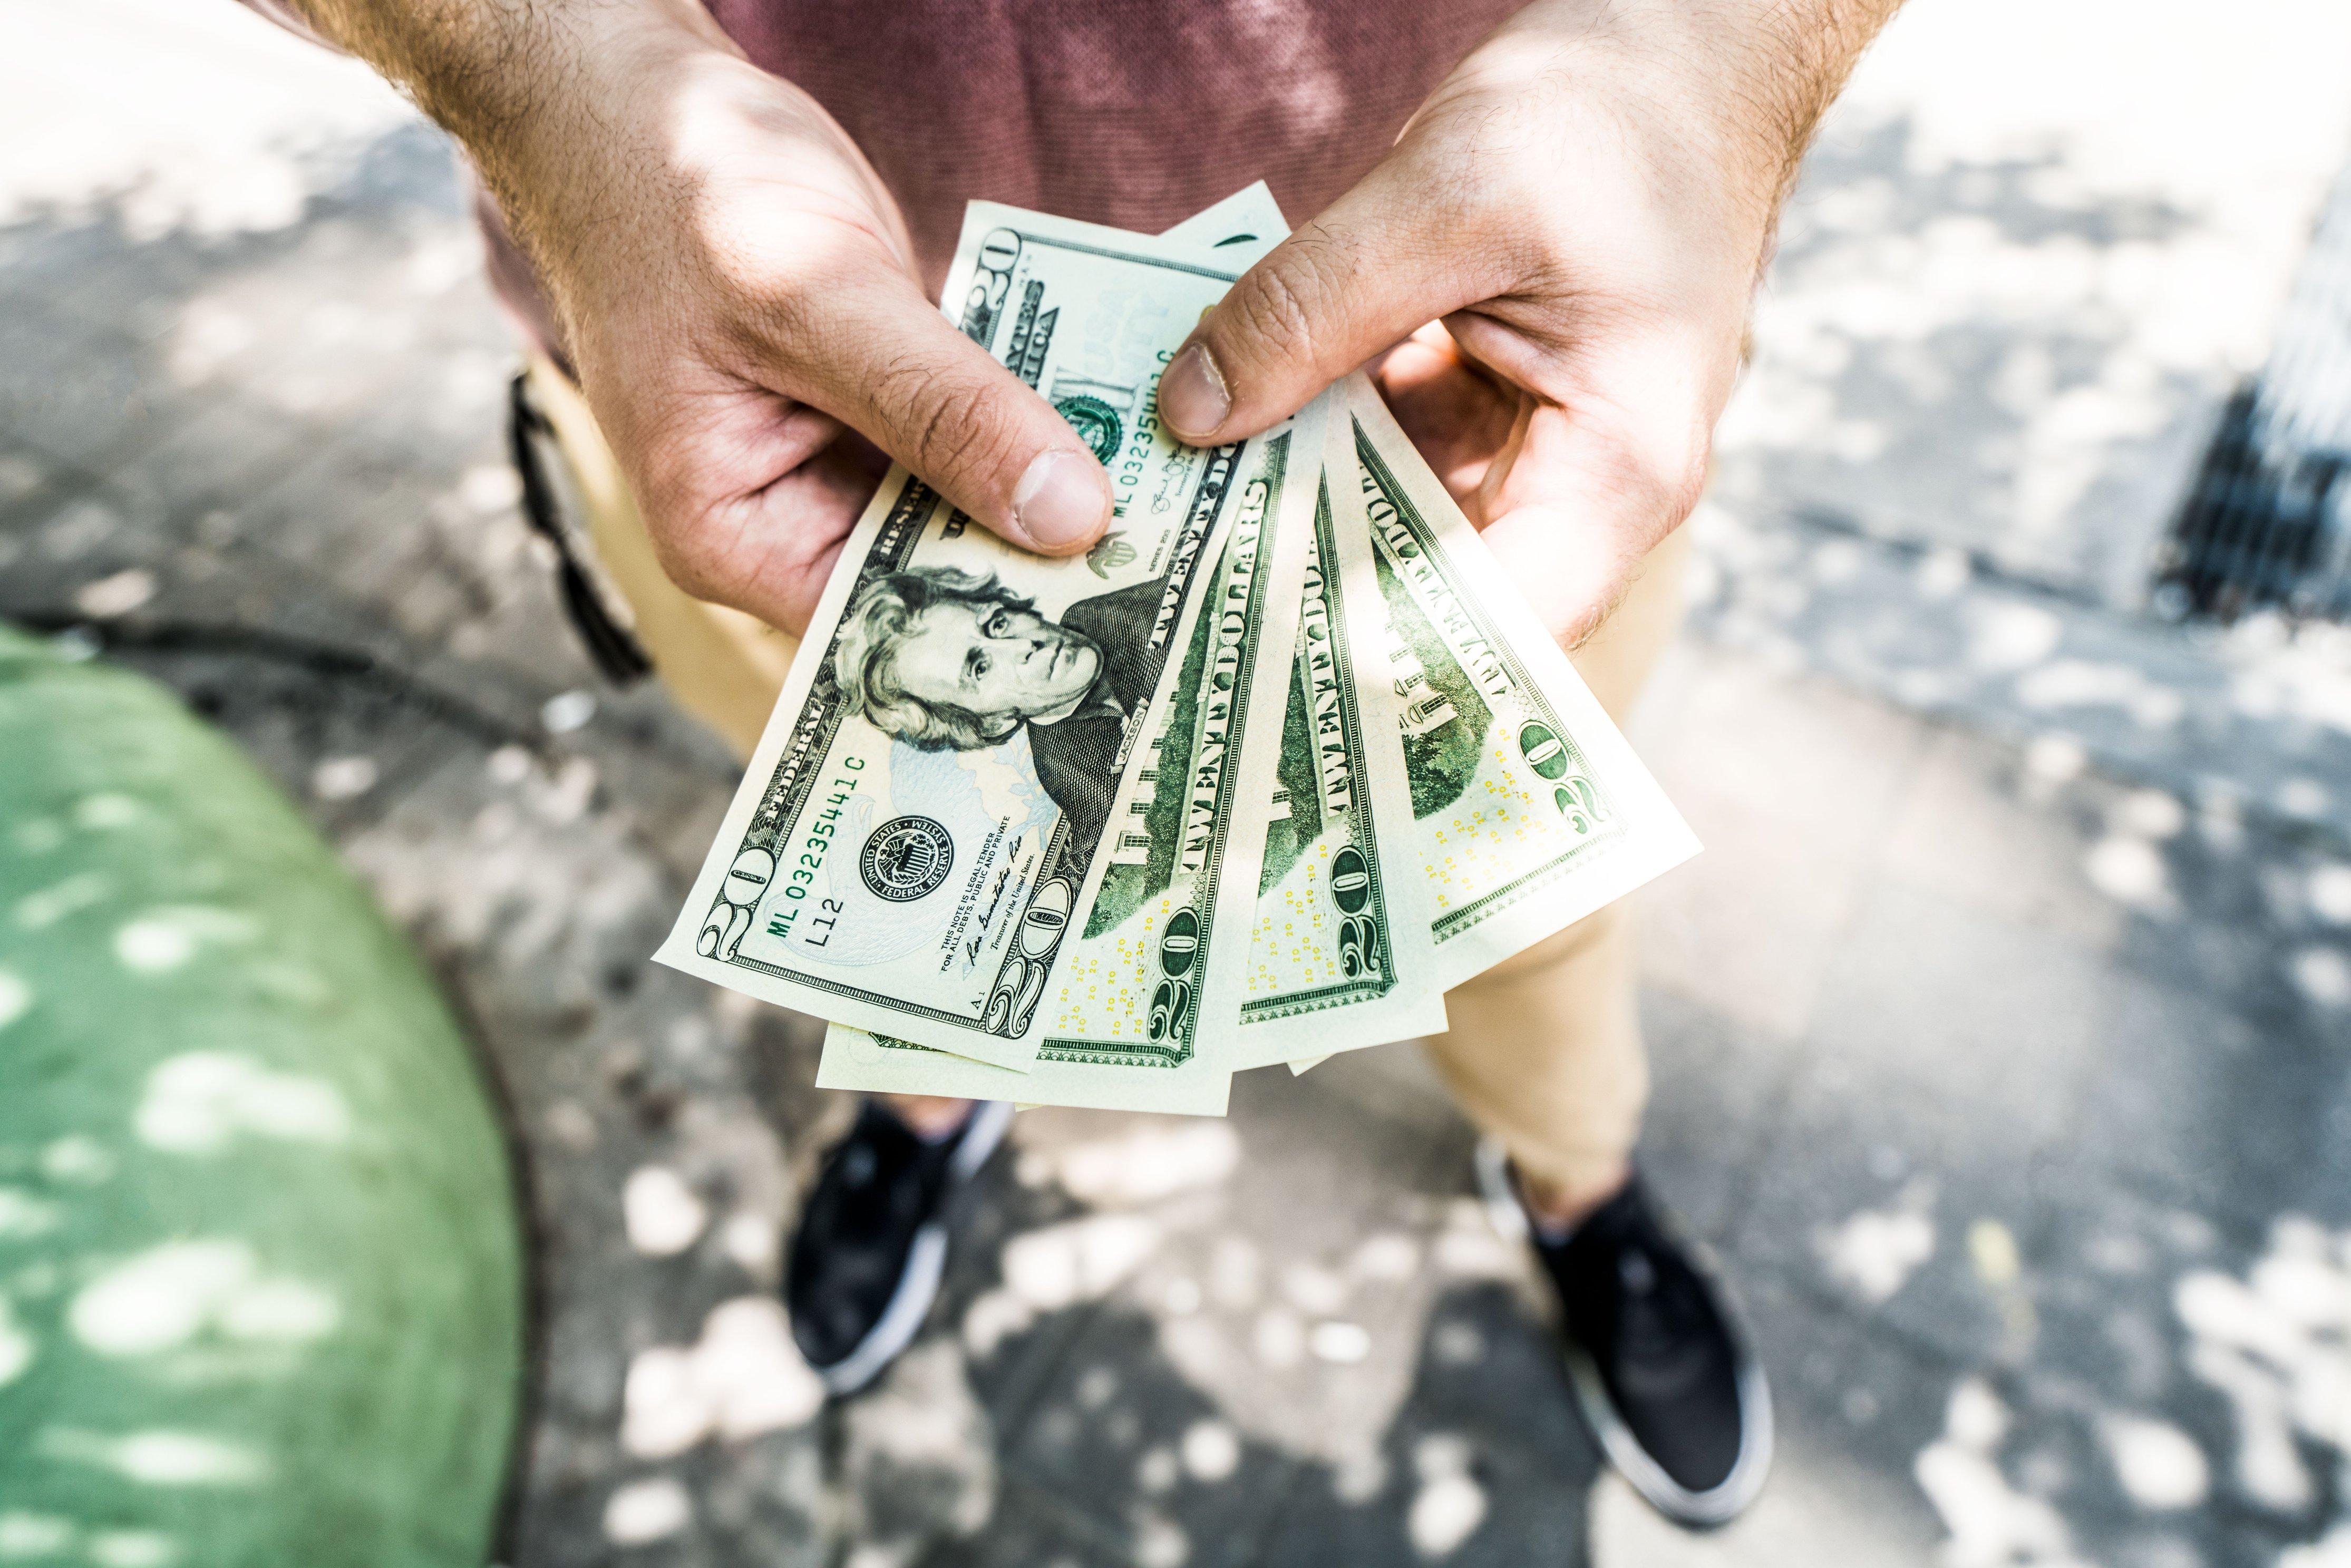 StockSnap 11HX337XXR - How to earn money online — A beginners guide